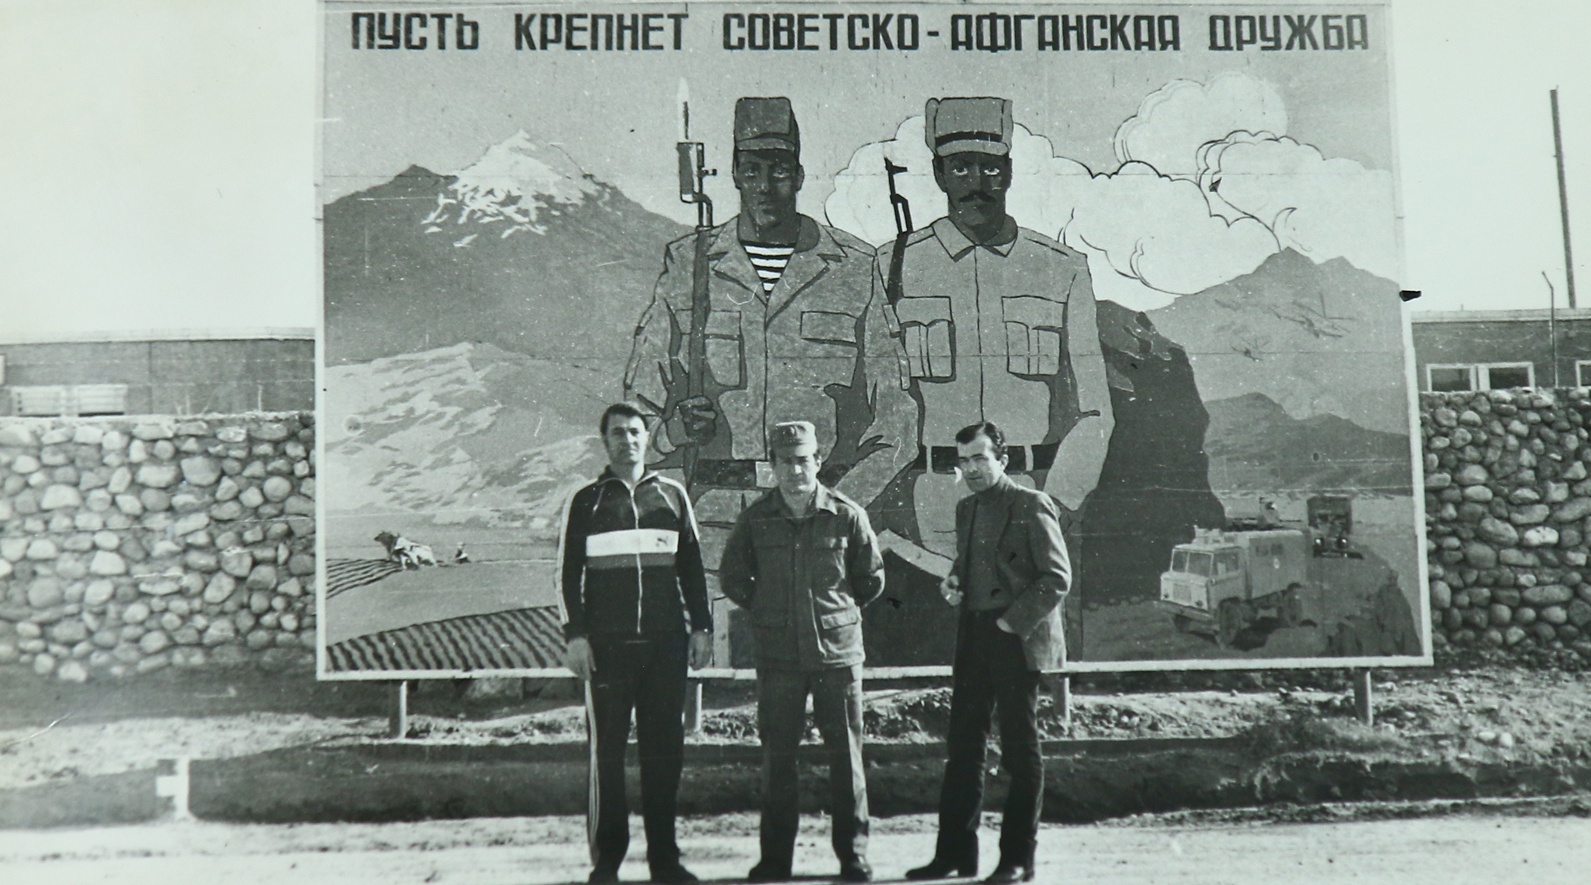 Вячеслав Дзотцоев (в центре) с сослуживцами